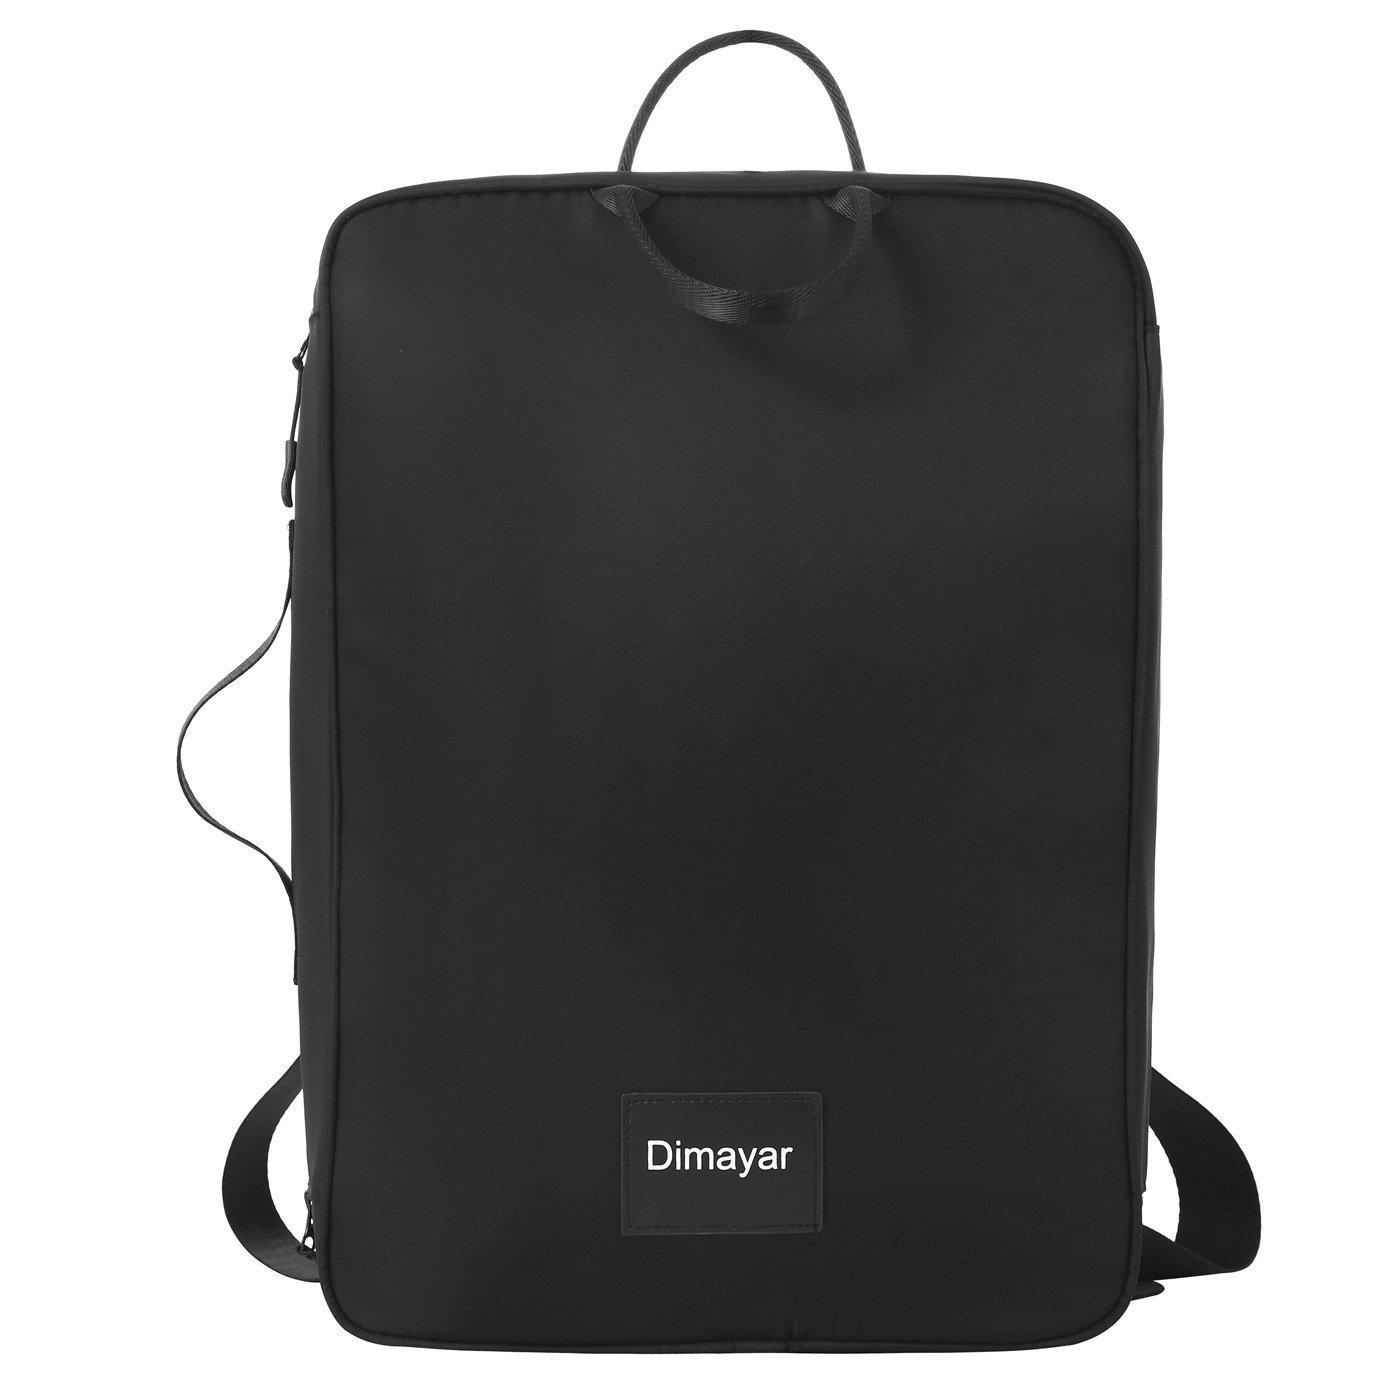 Travel Backpack by Dimayar Water Resistant Traveling Backpack for Men & Women Lightweight Slim Business Backpack 15.6'' Travel Laptop Backpack Black